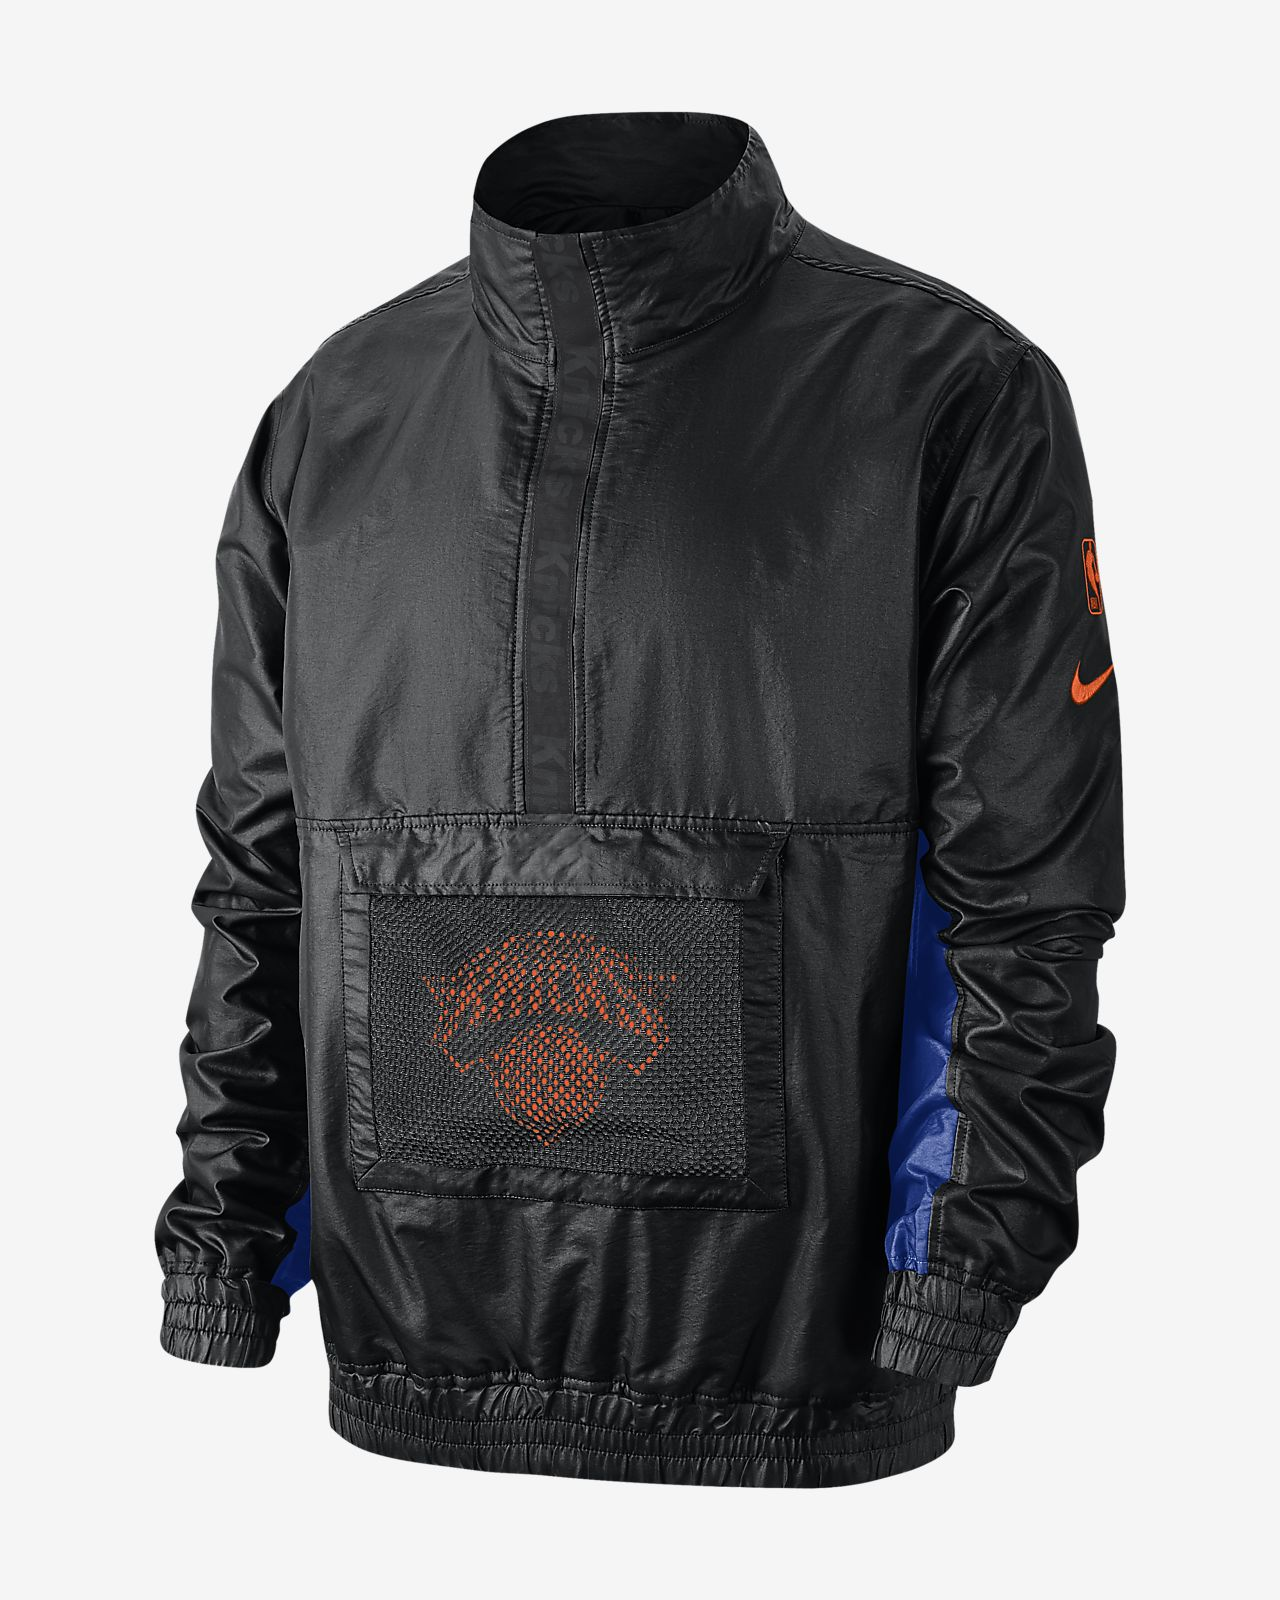 New York Knicks Nike könnyű férfi NBA-s kabát